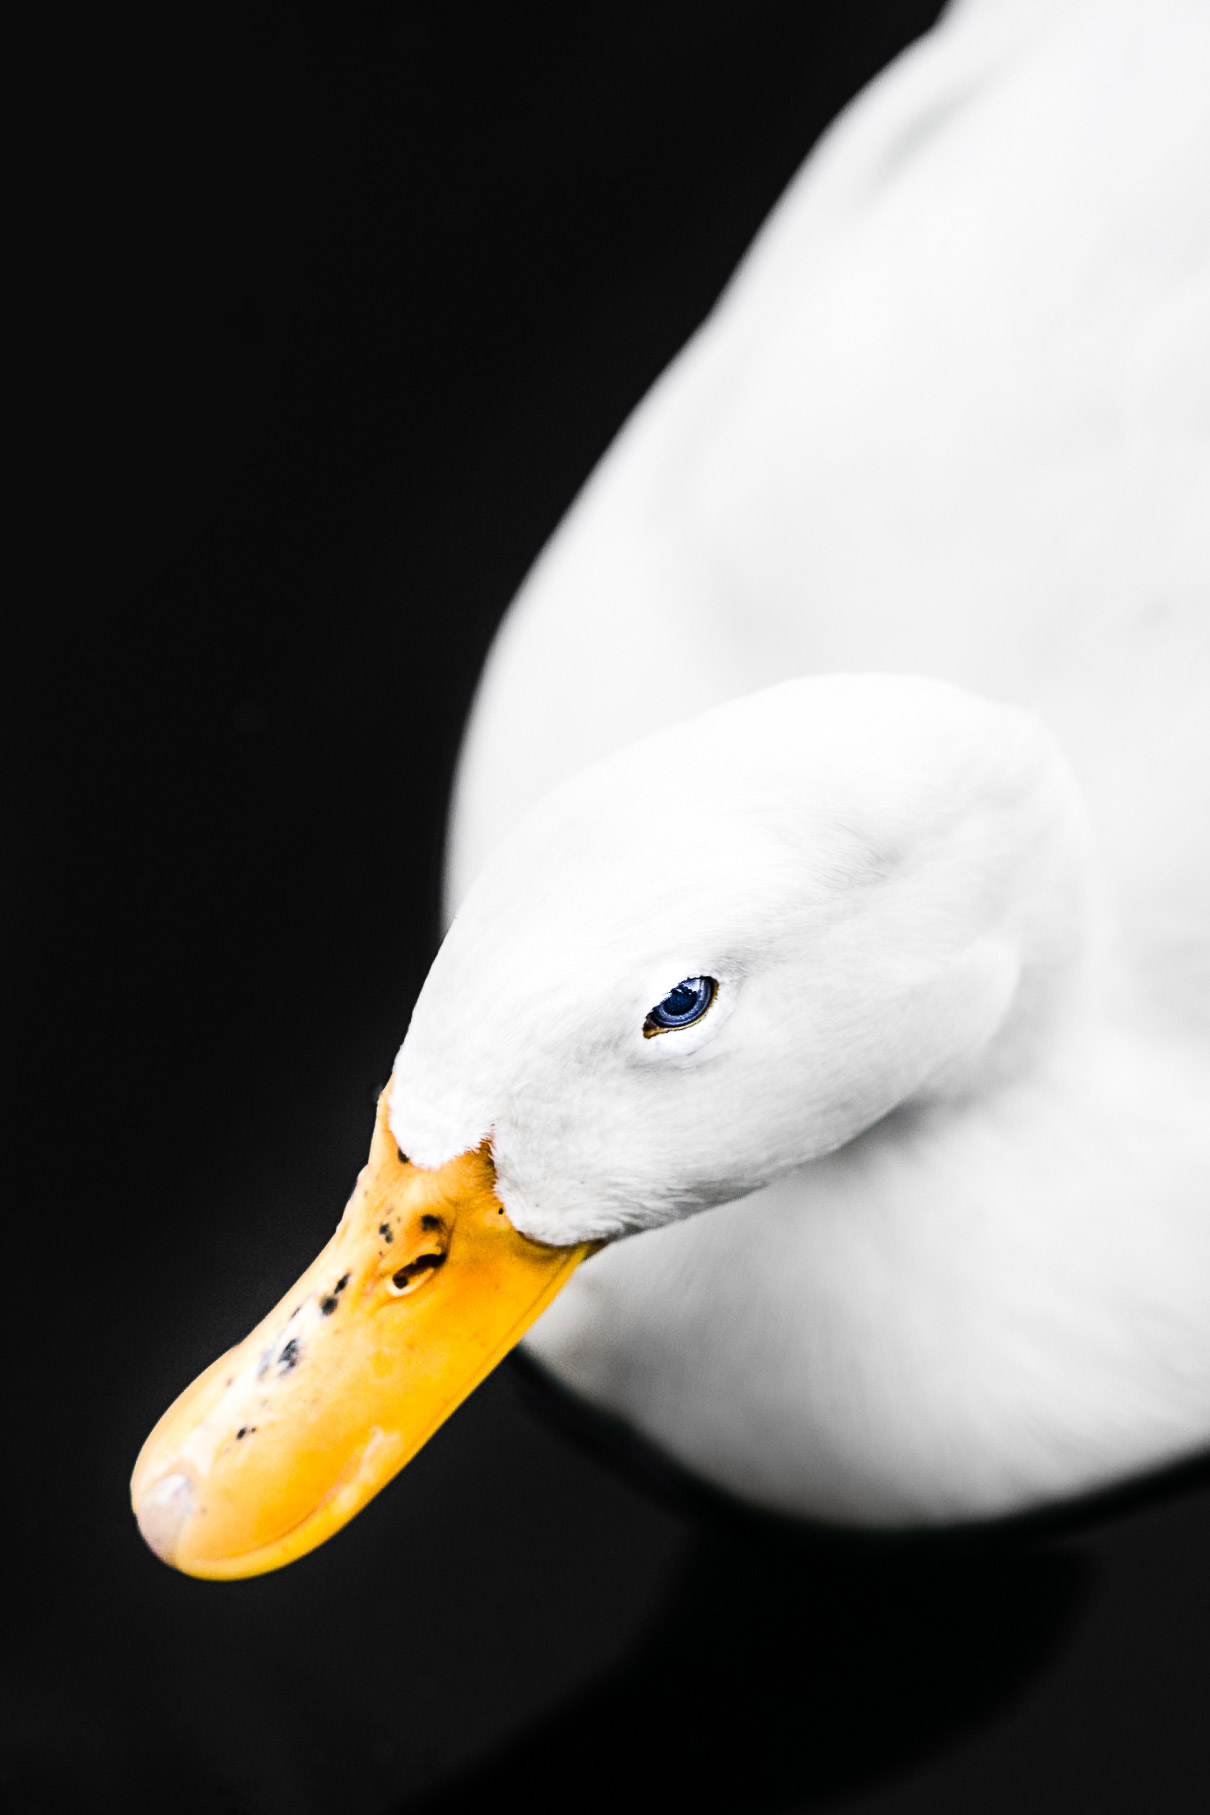 alexa-wright-color-photography-duck.jpg